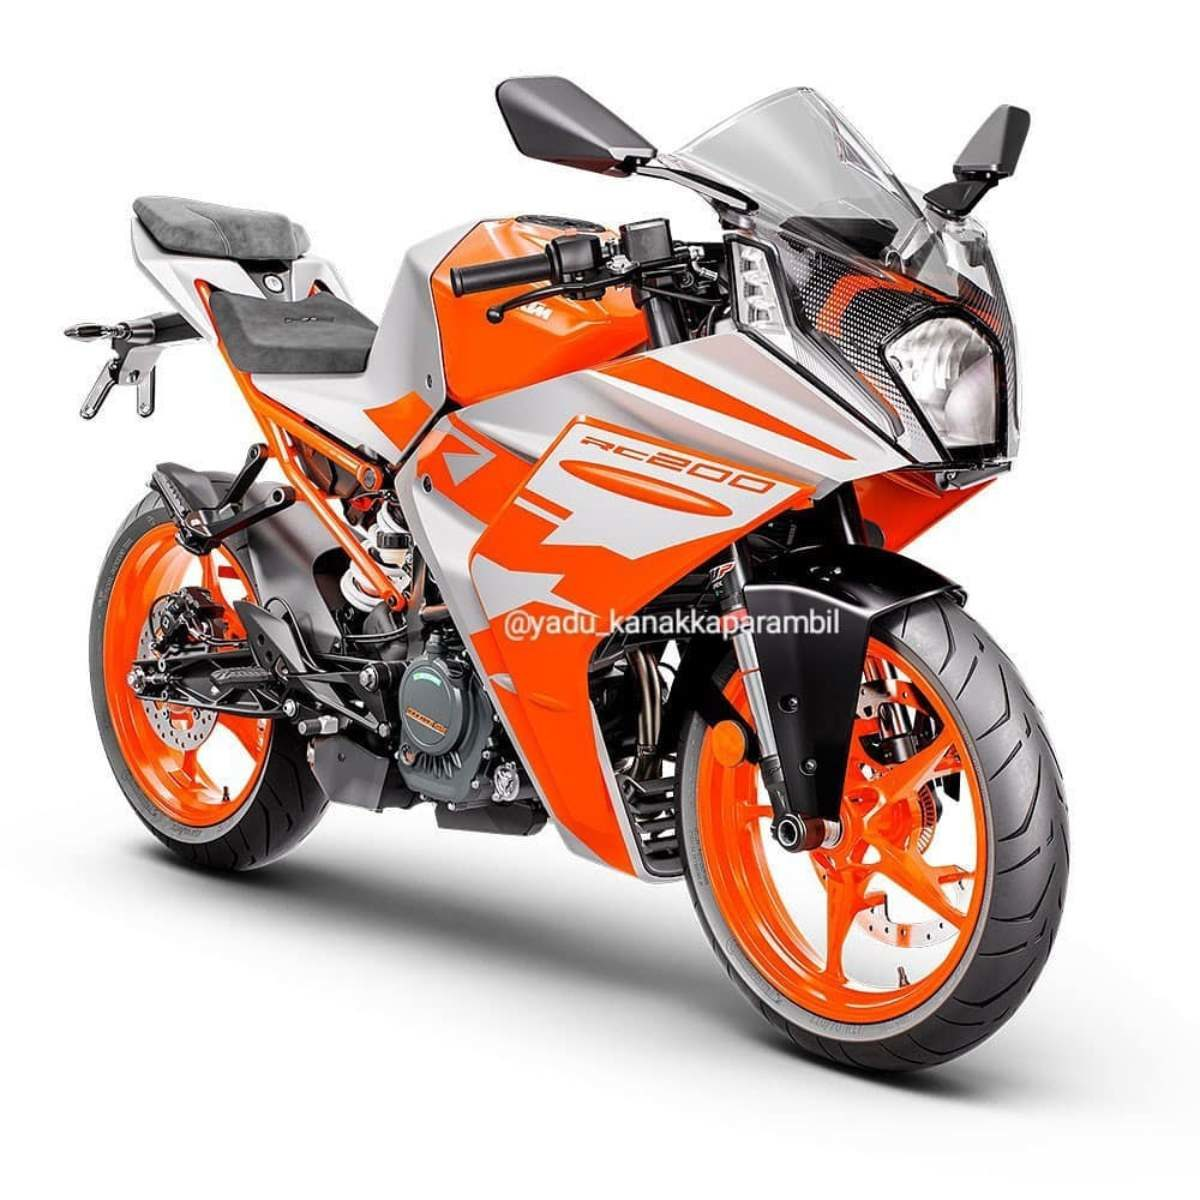 2022 KTM RC 200 Leaked